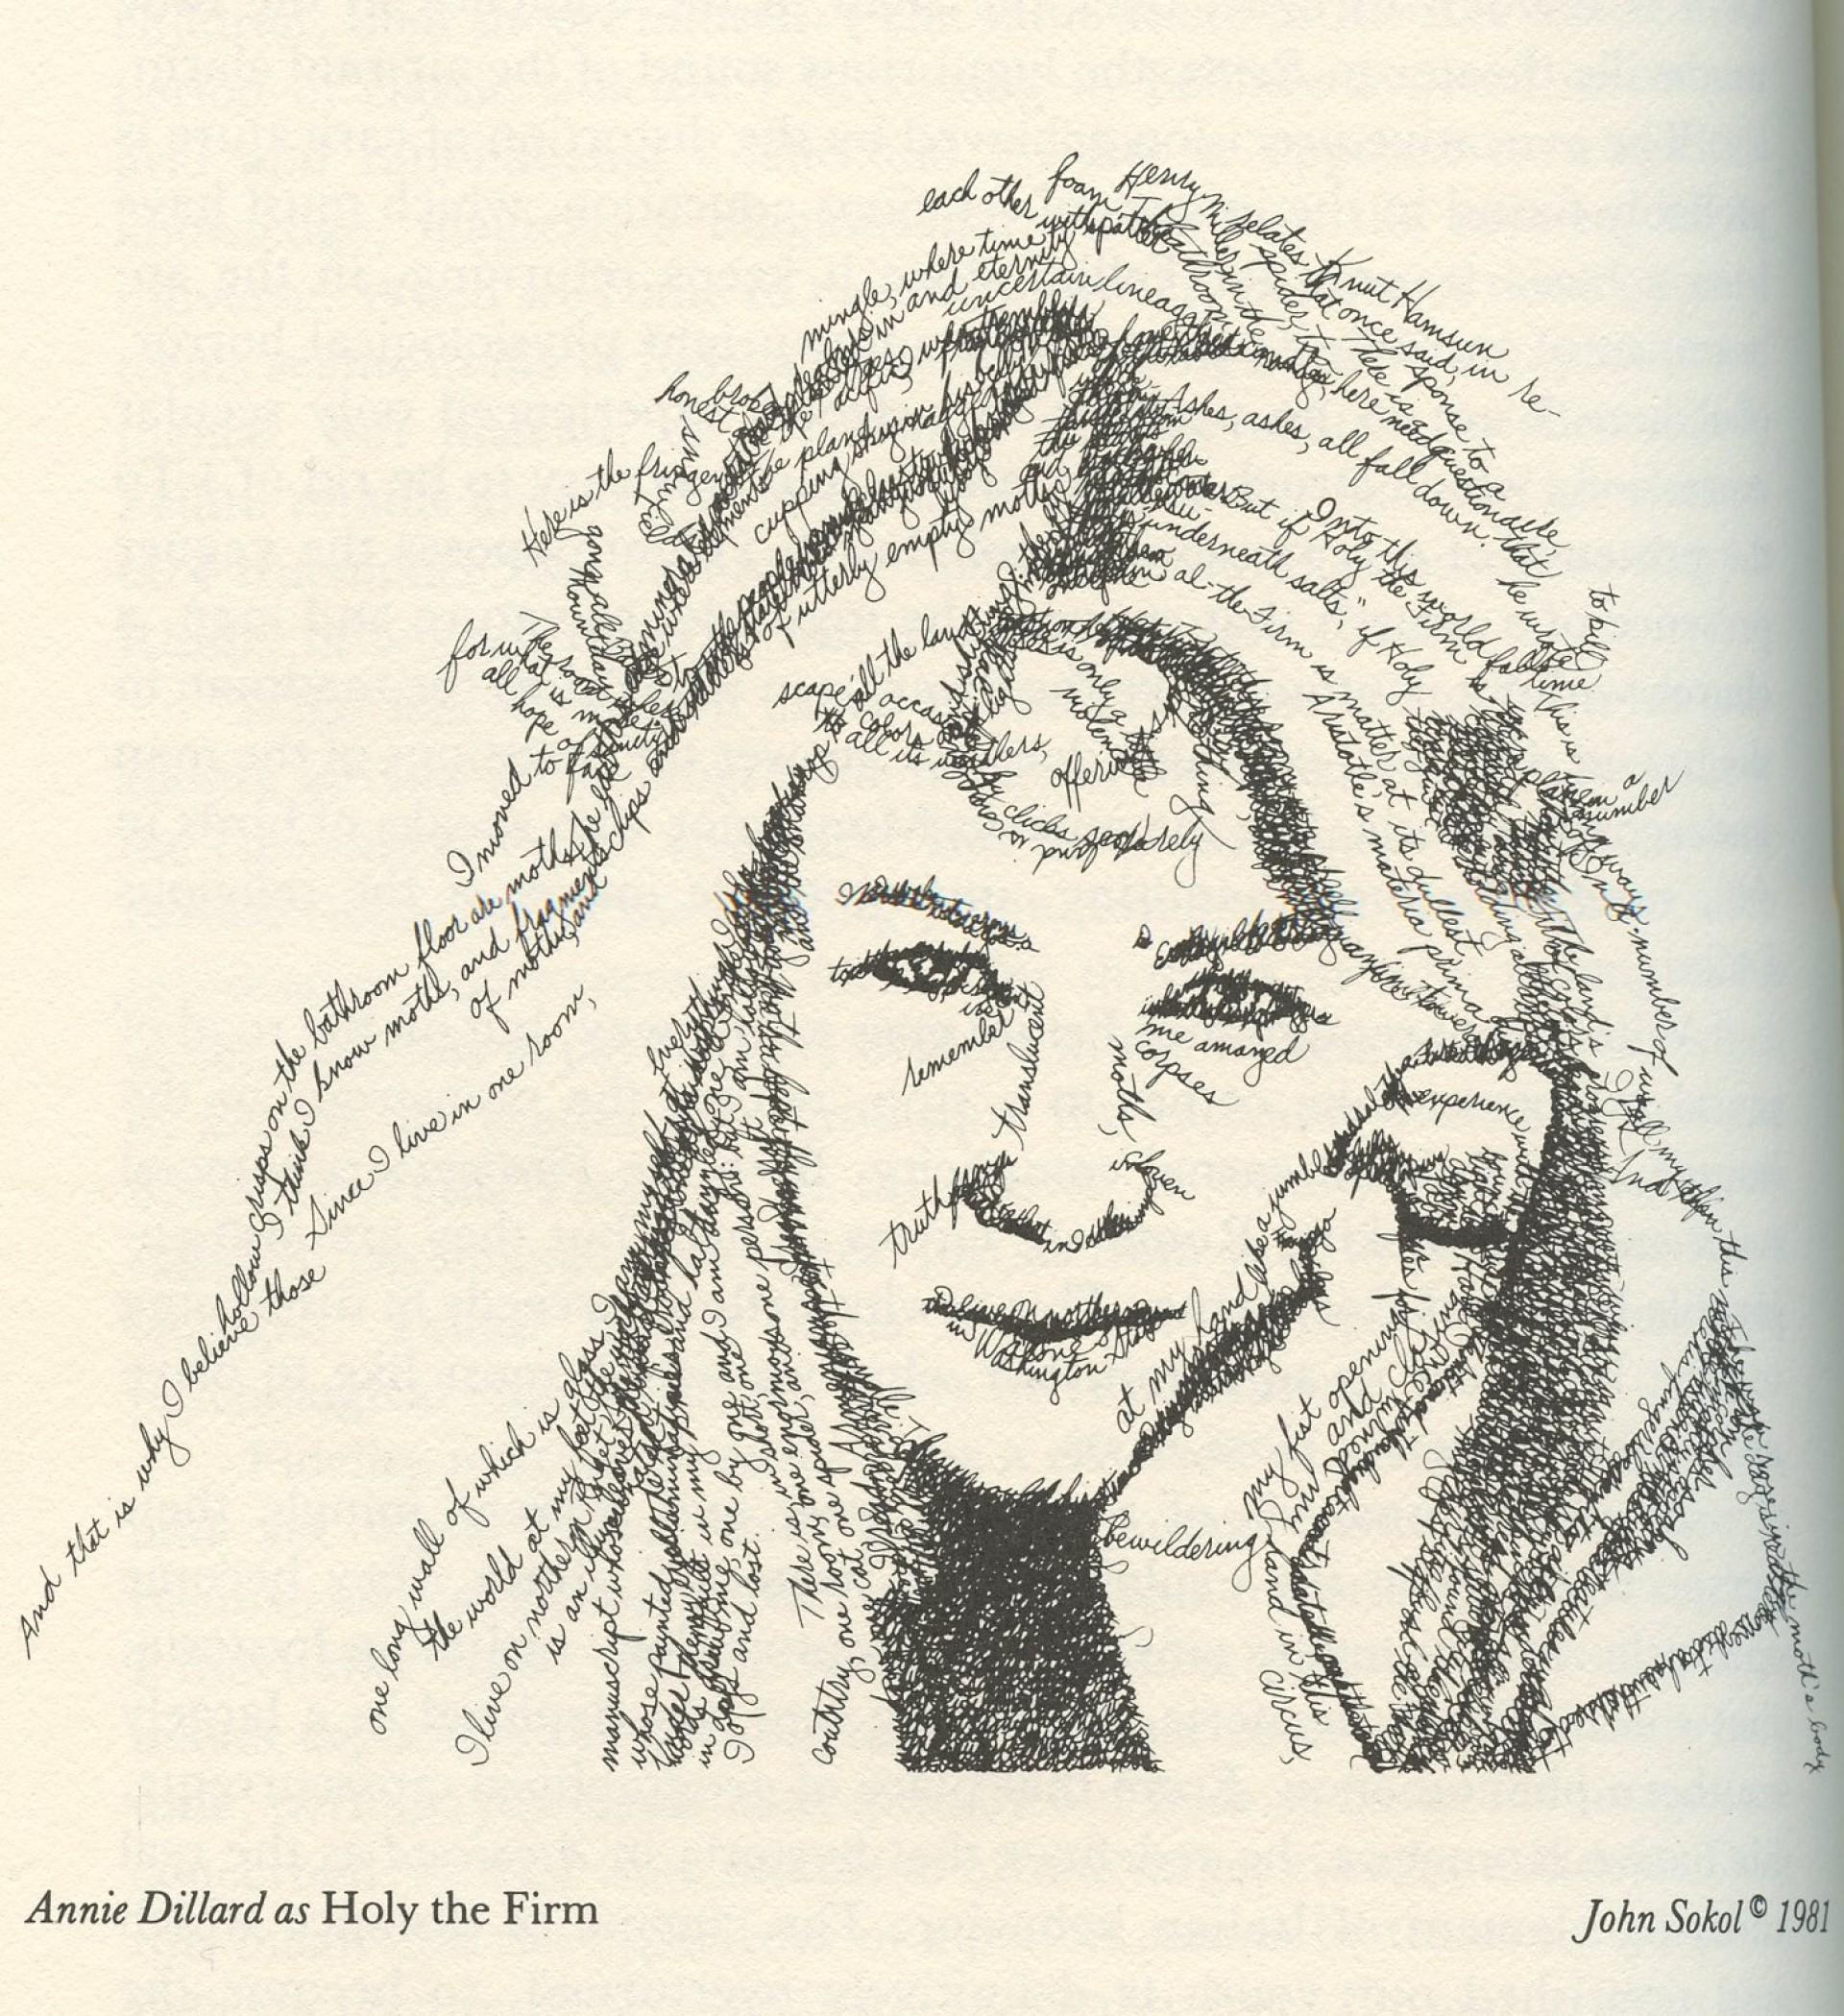 008 Essay Example Annie Dillard Essays Stirring Stunt Pilot Pdf An American Childhood 1920